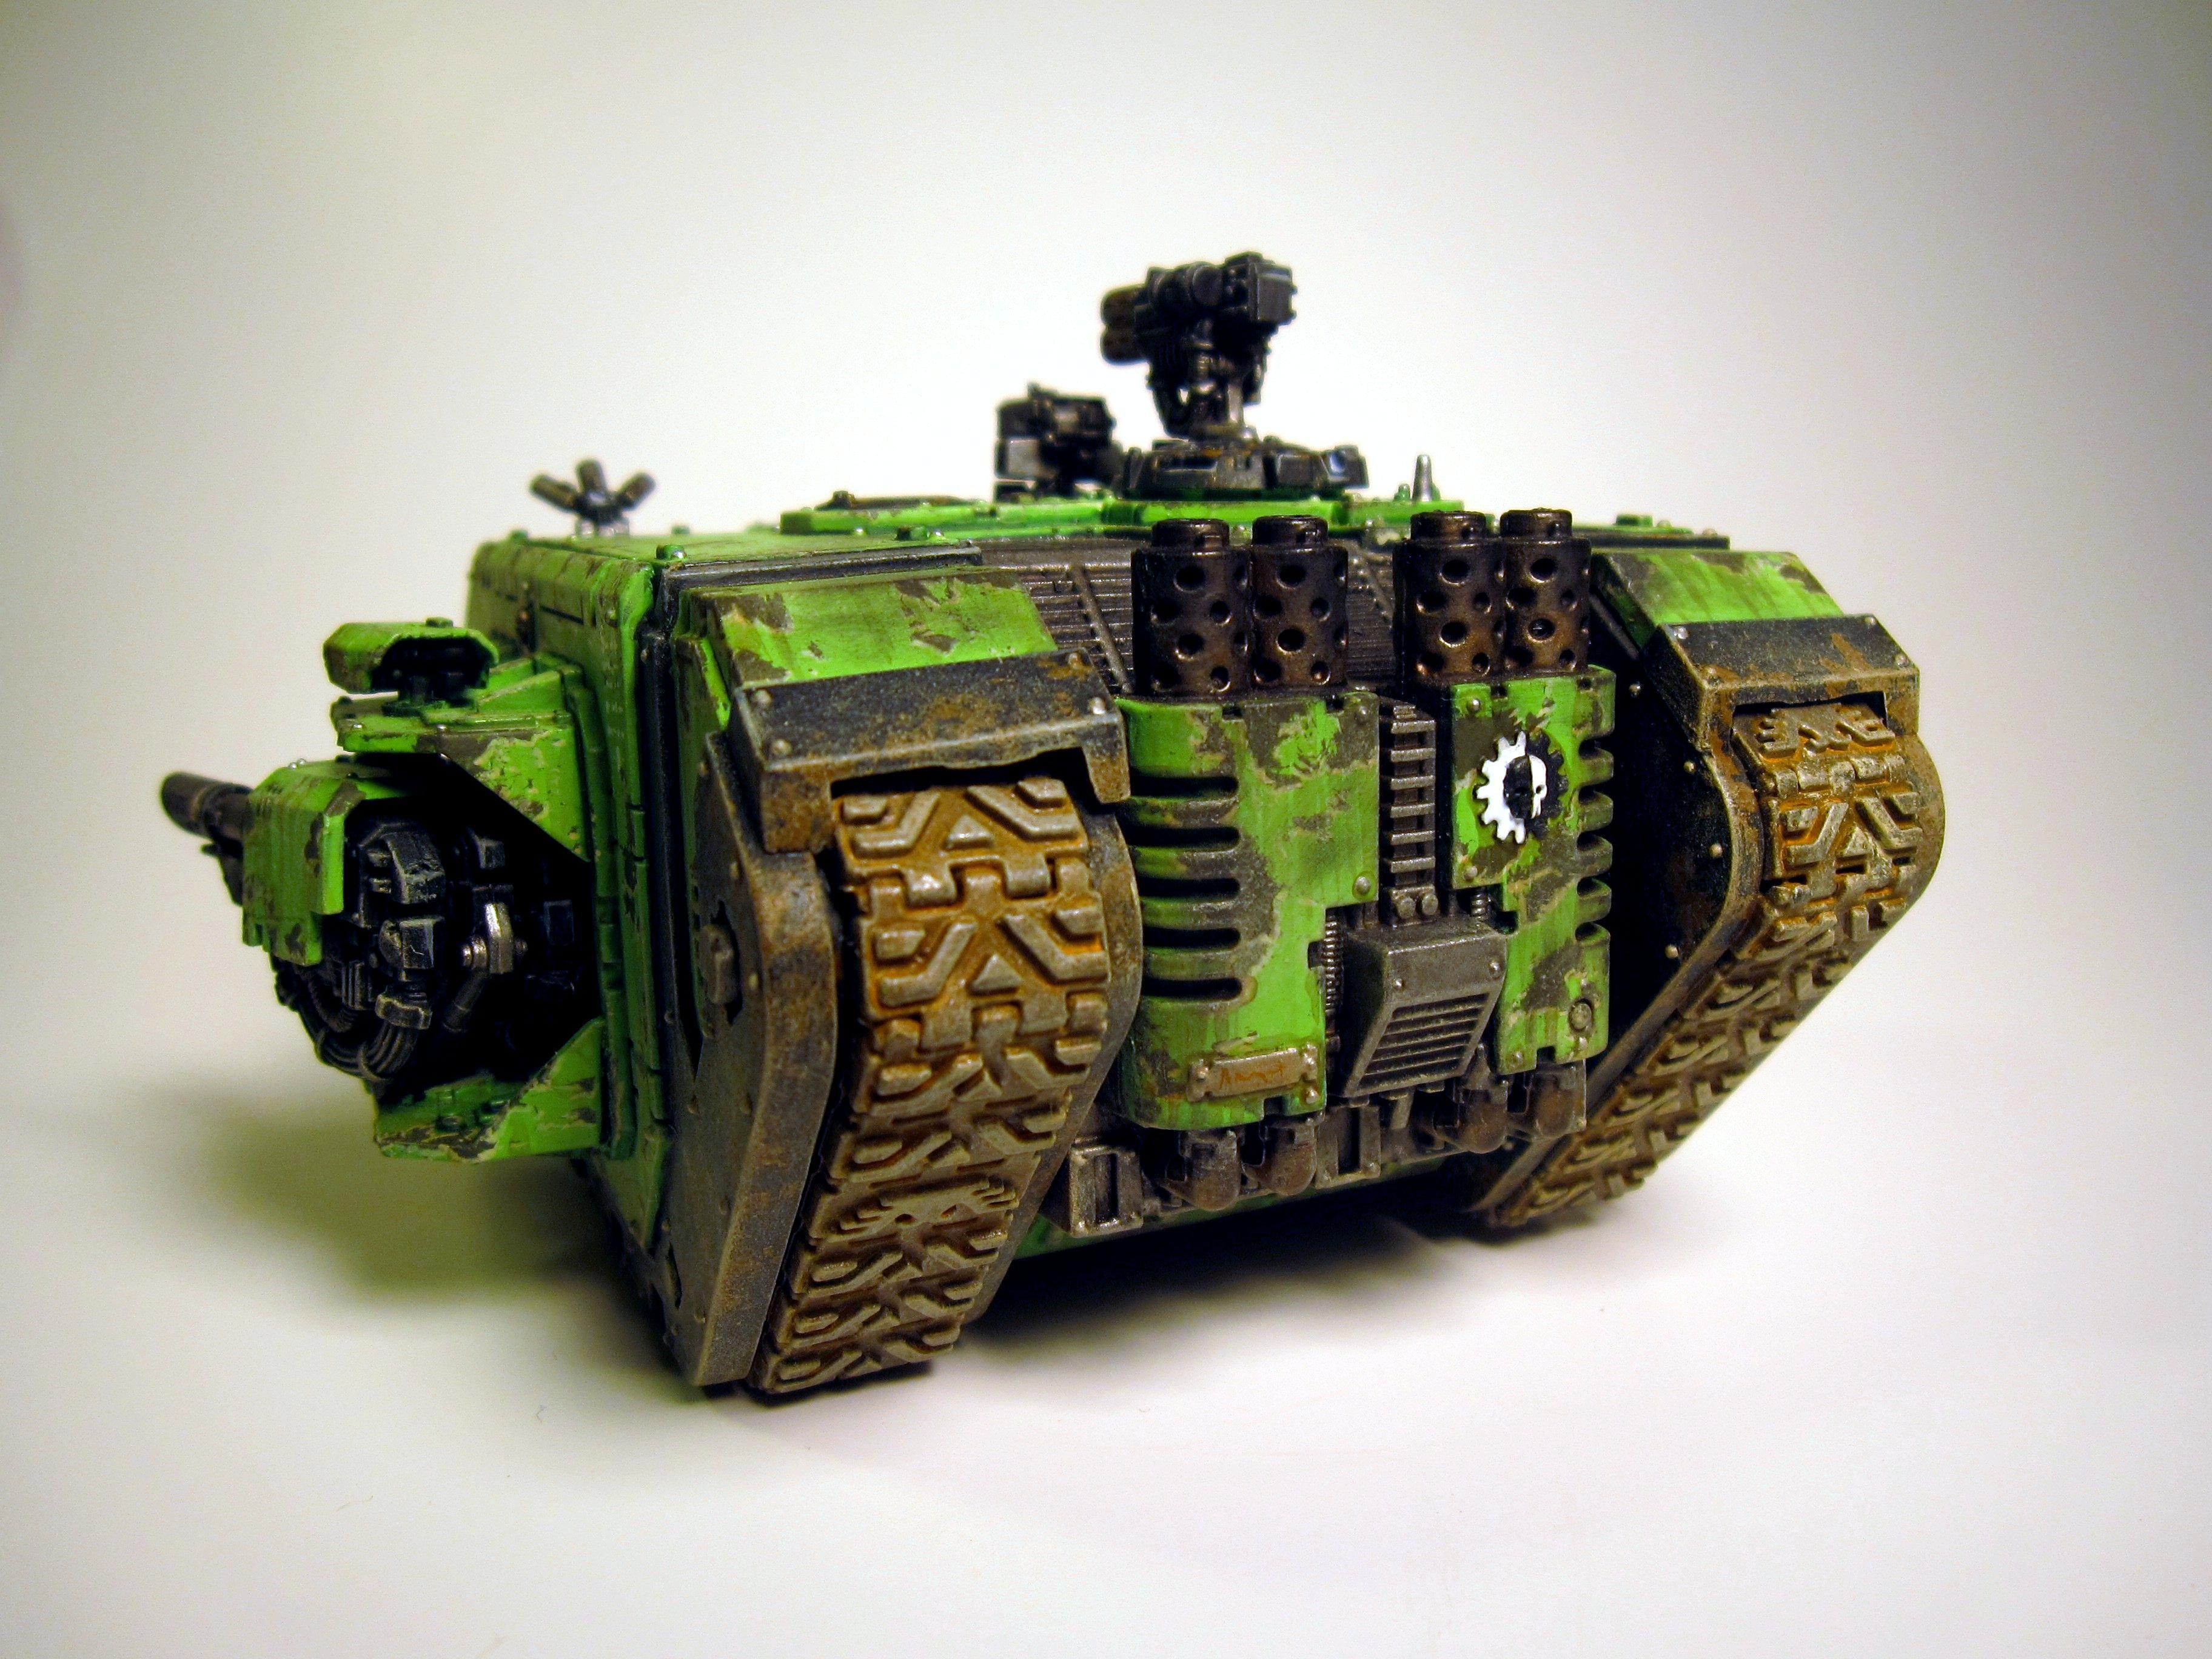 Badab War, Land Raider, Sons Of Medusa, Space Marines, Warhammer 40,000